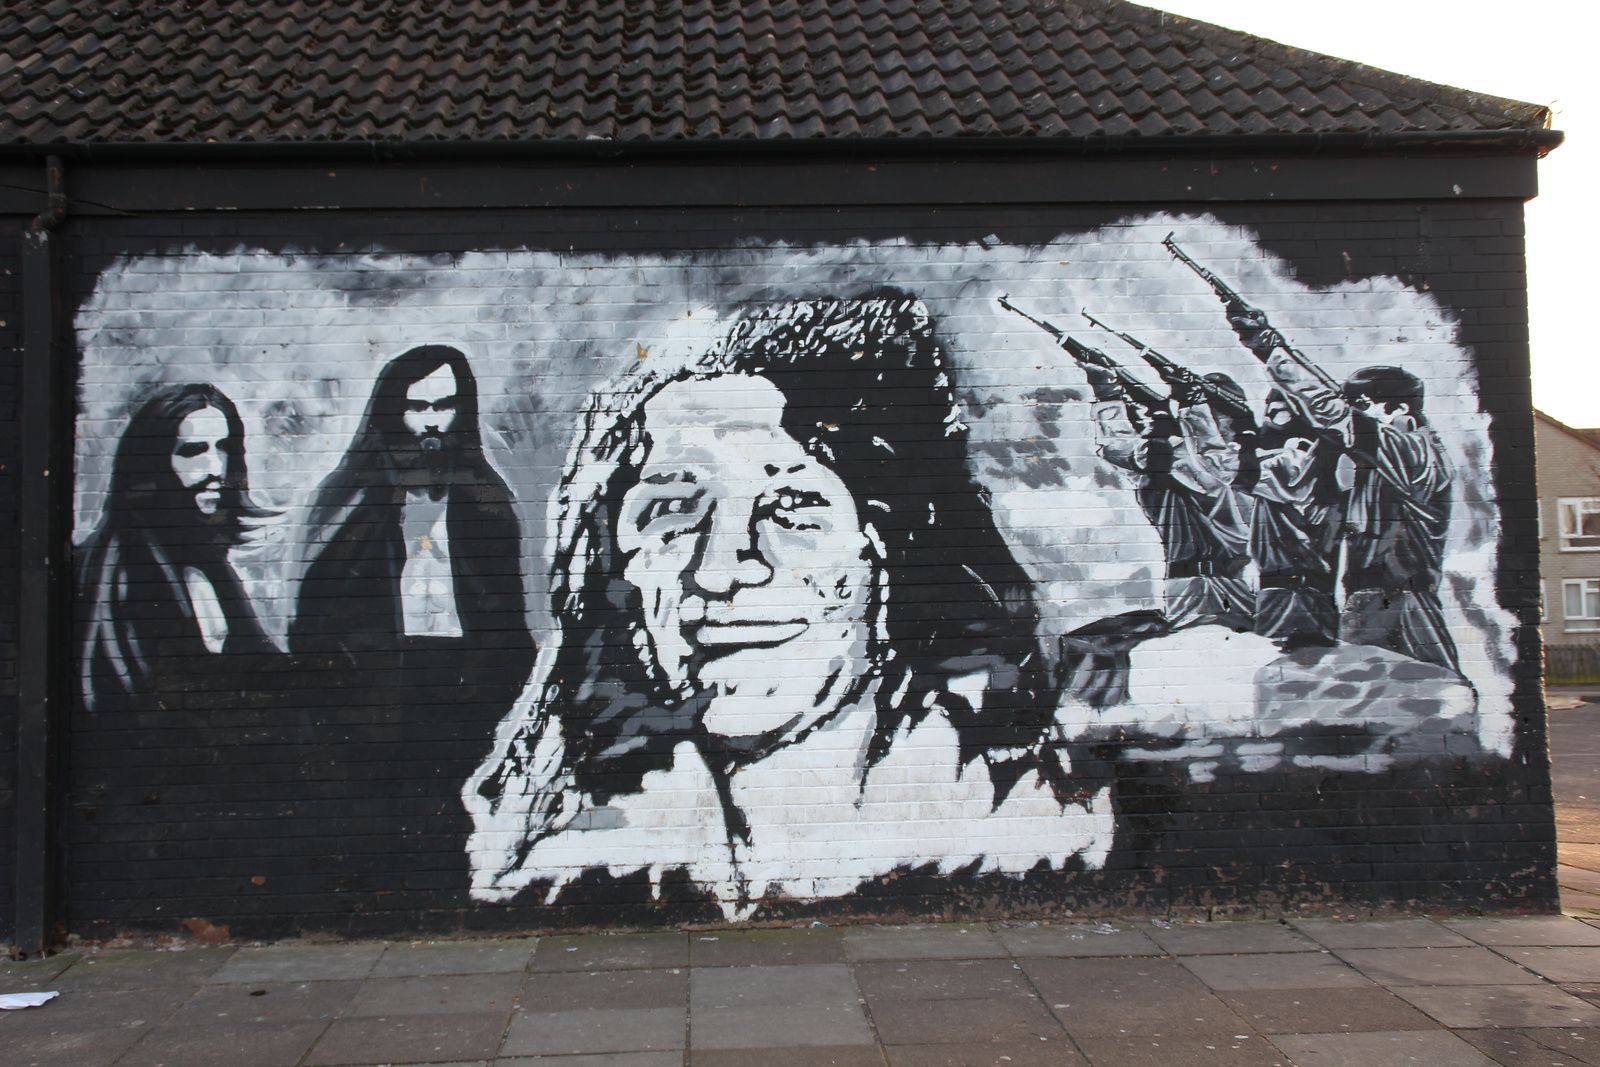 512) Twinbrook Road, West Belfast